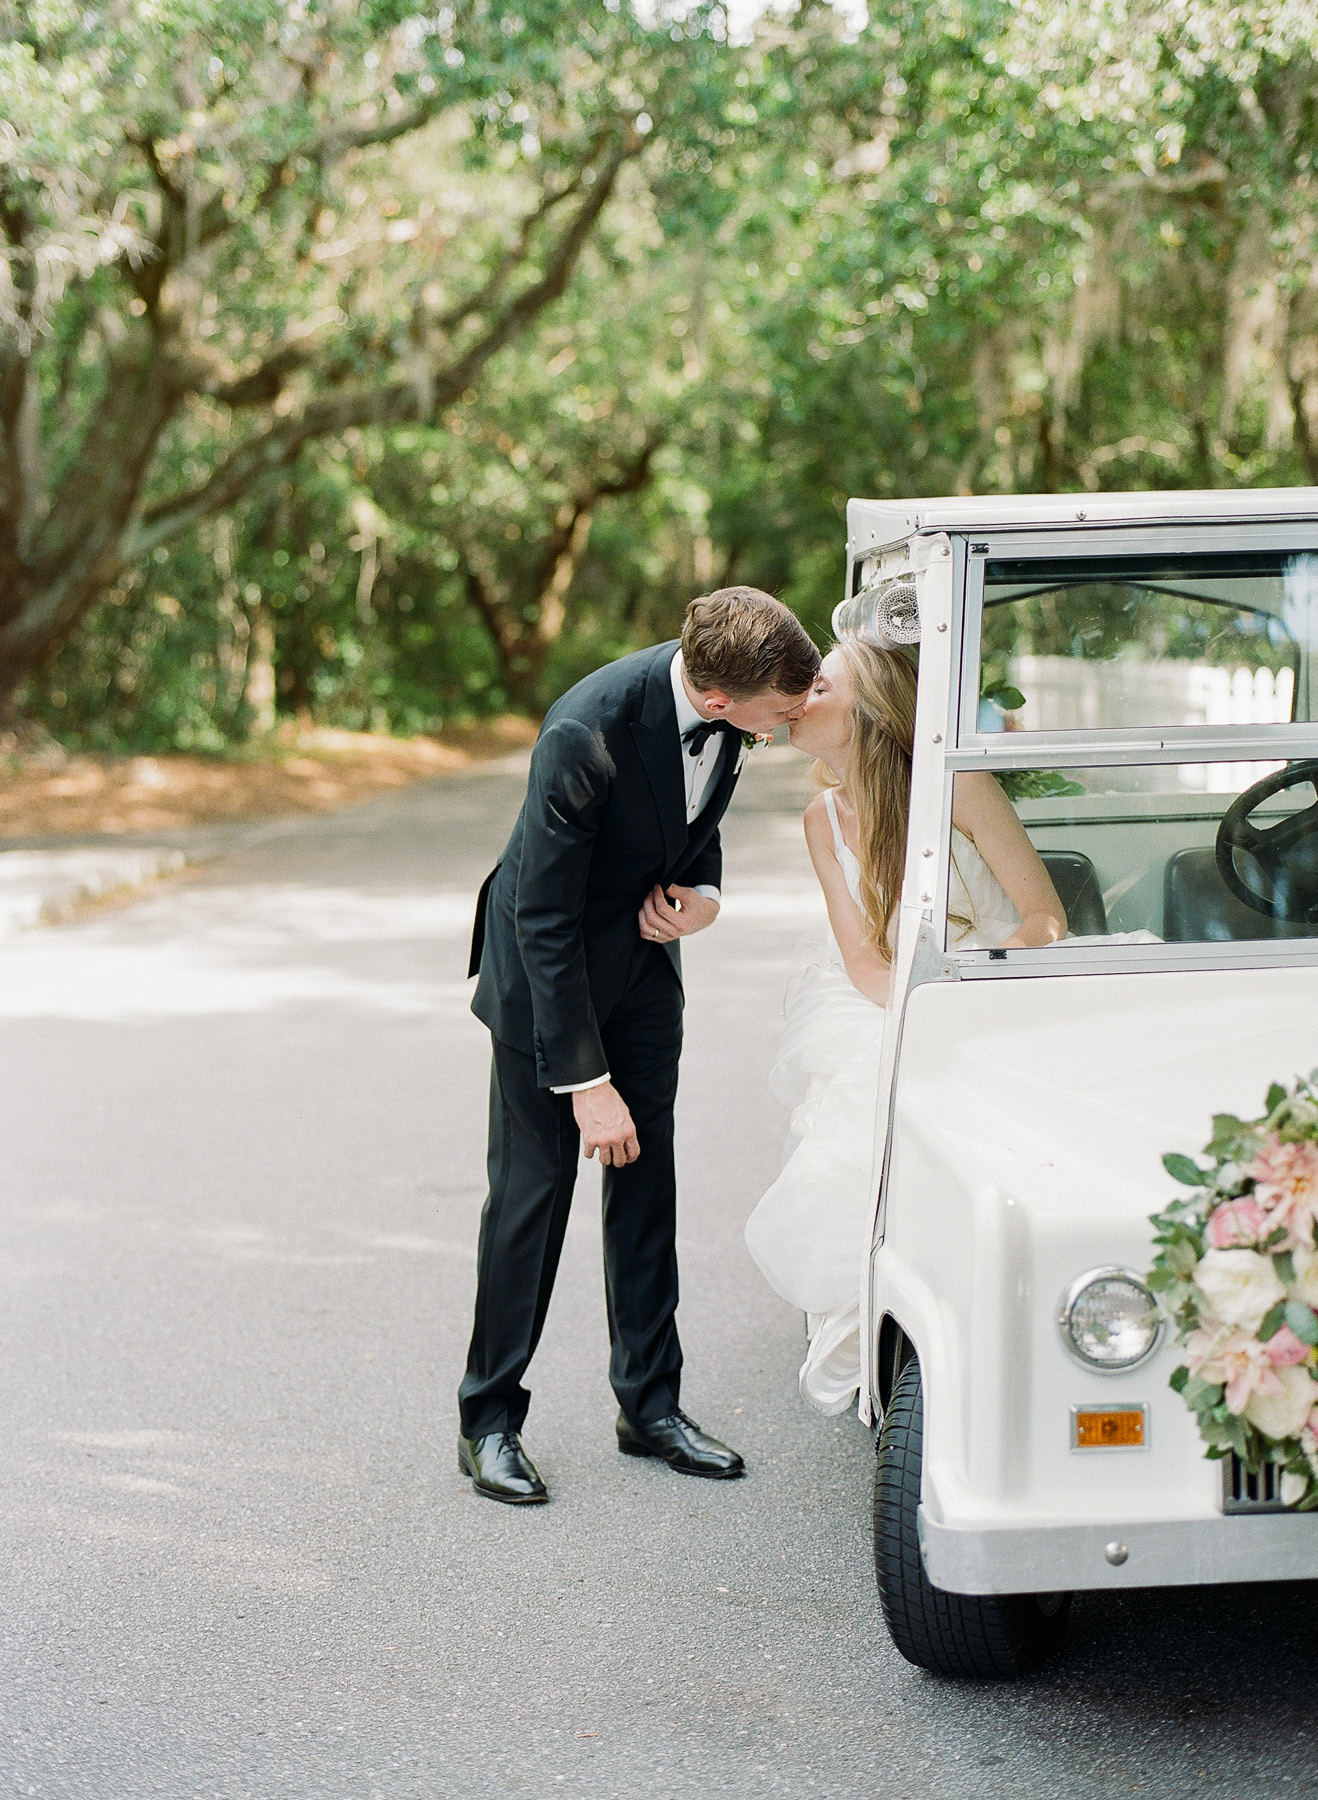 NC-wedding-photographer-best-11.jpg